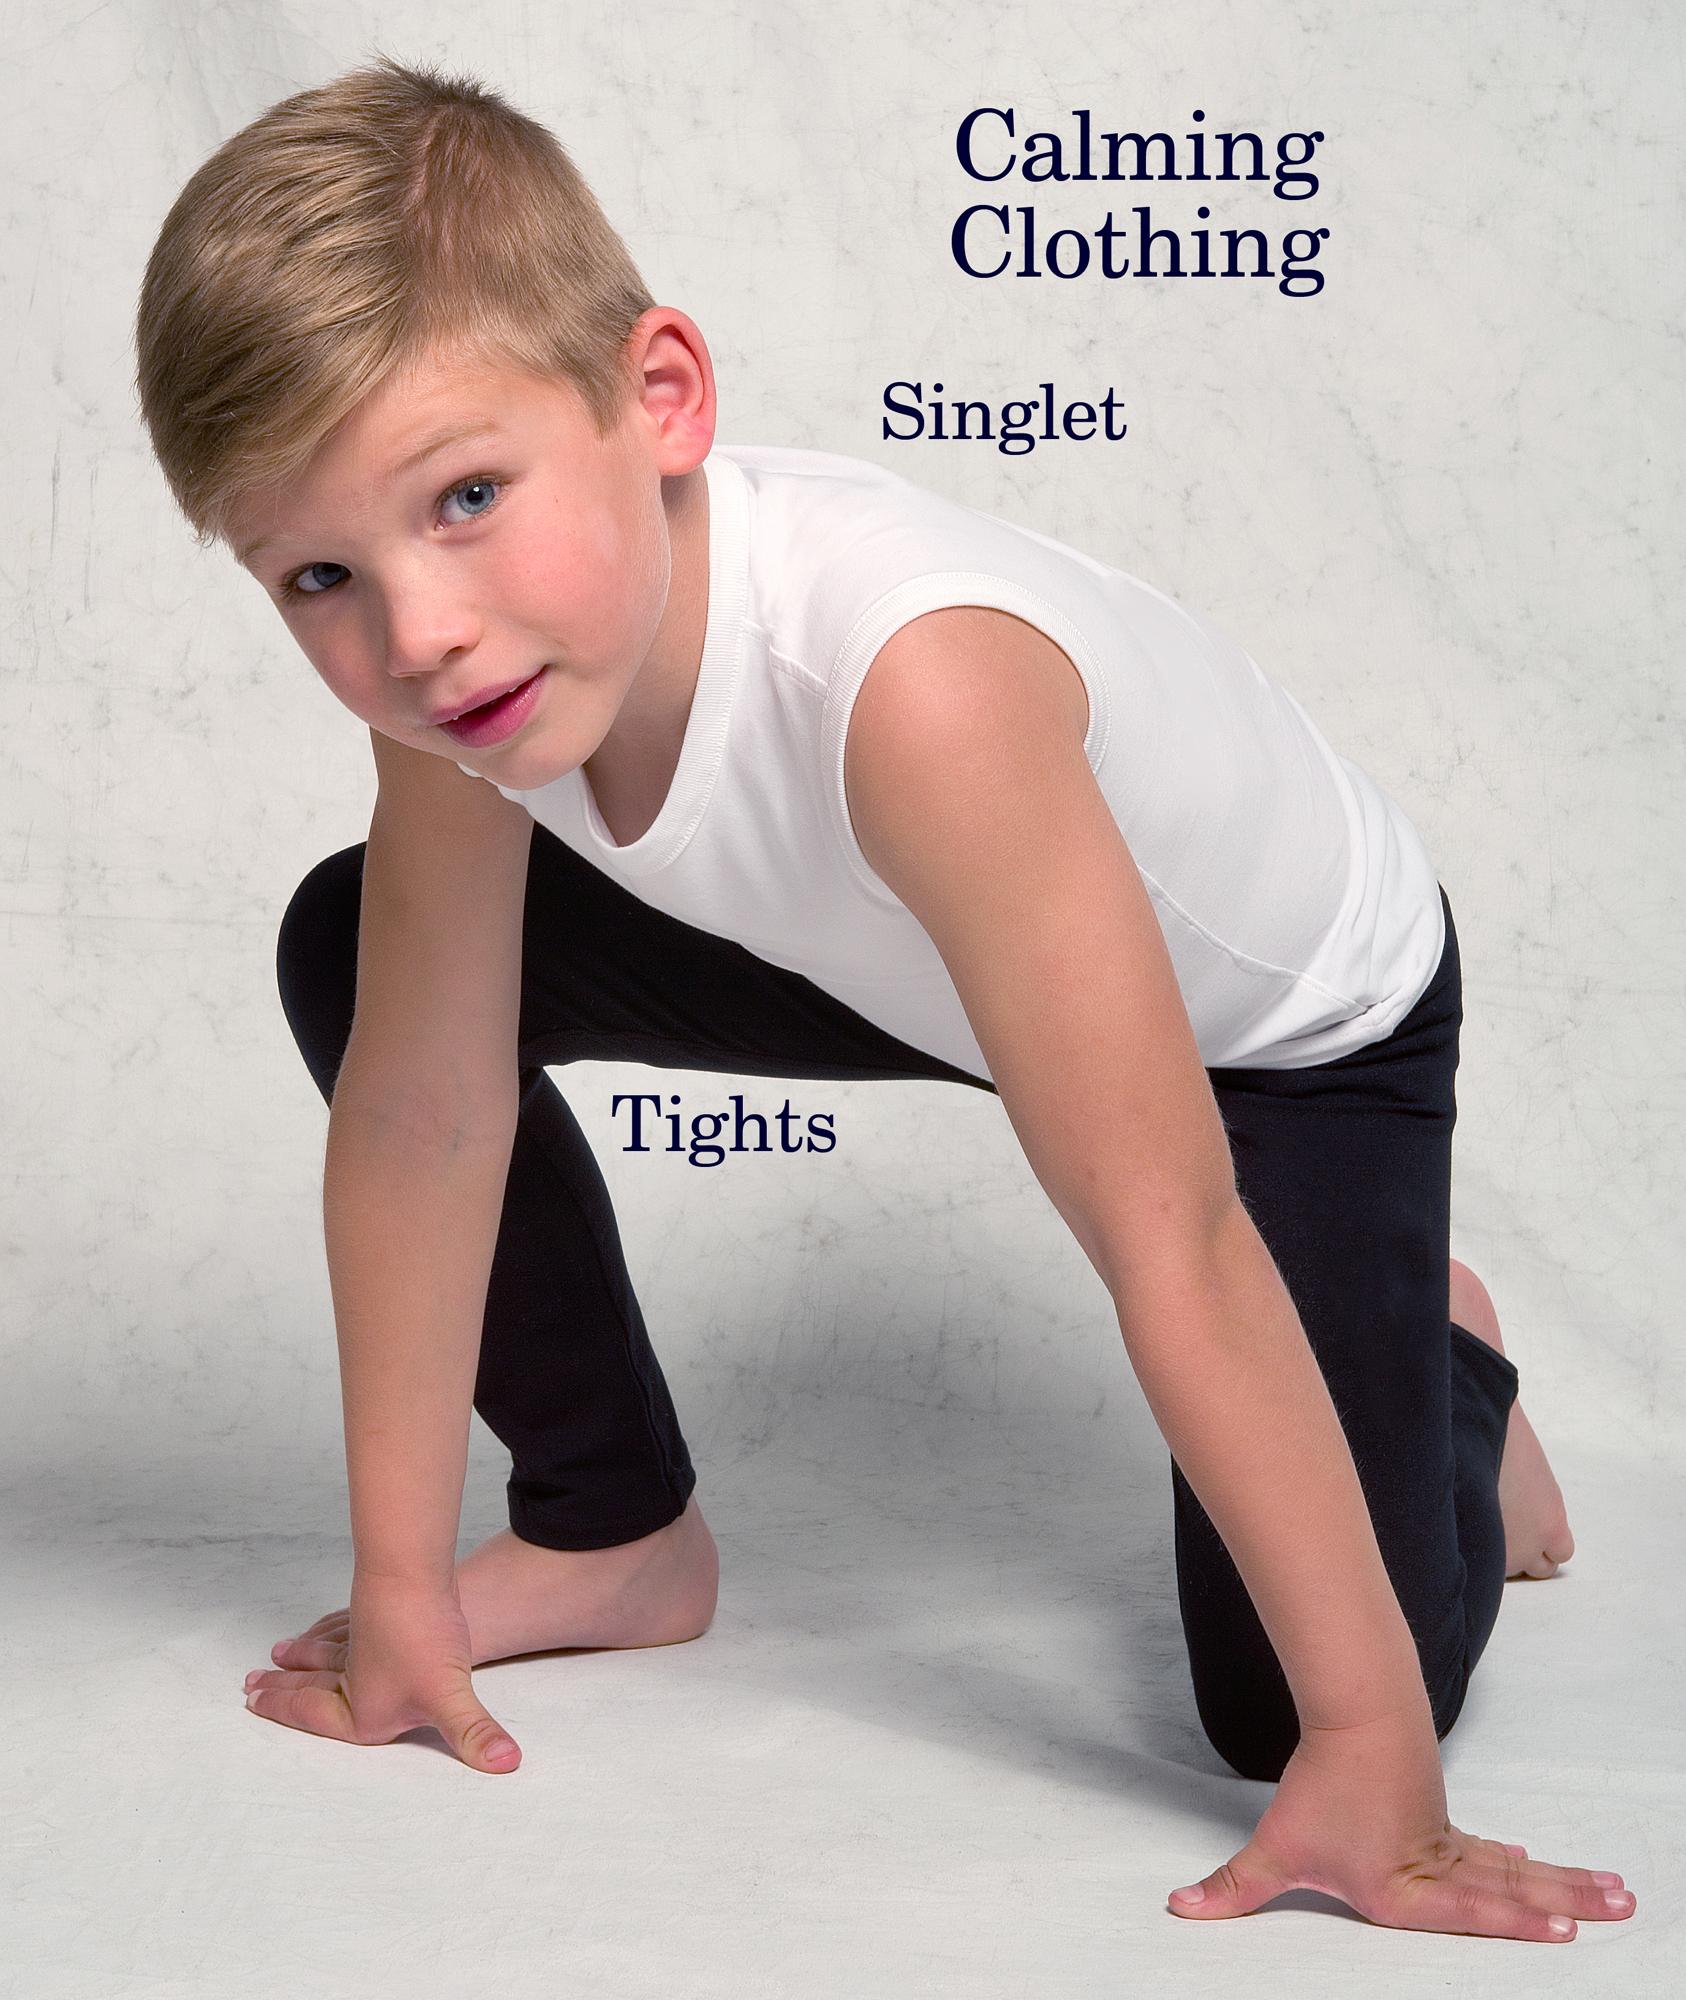 calming_clothing_tights_singlet.jpg